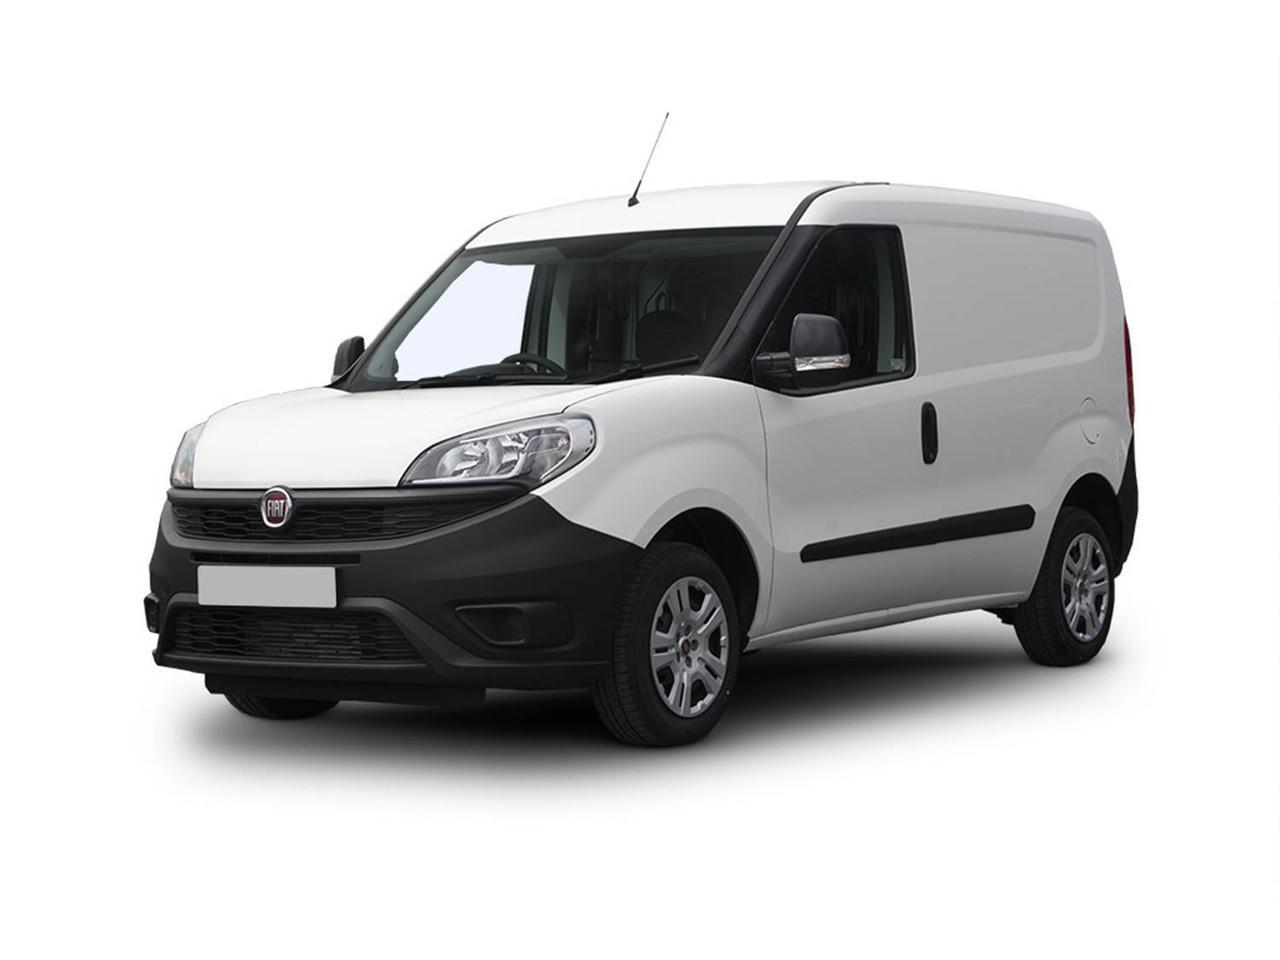 Fiat Doblò 1.4 easy pro business l1h1 benzine